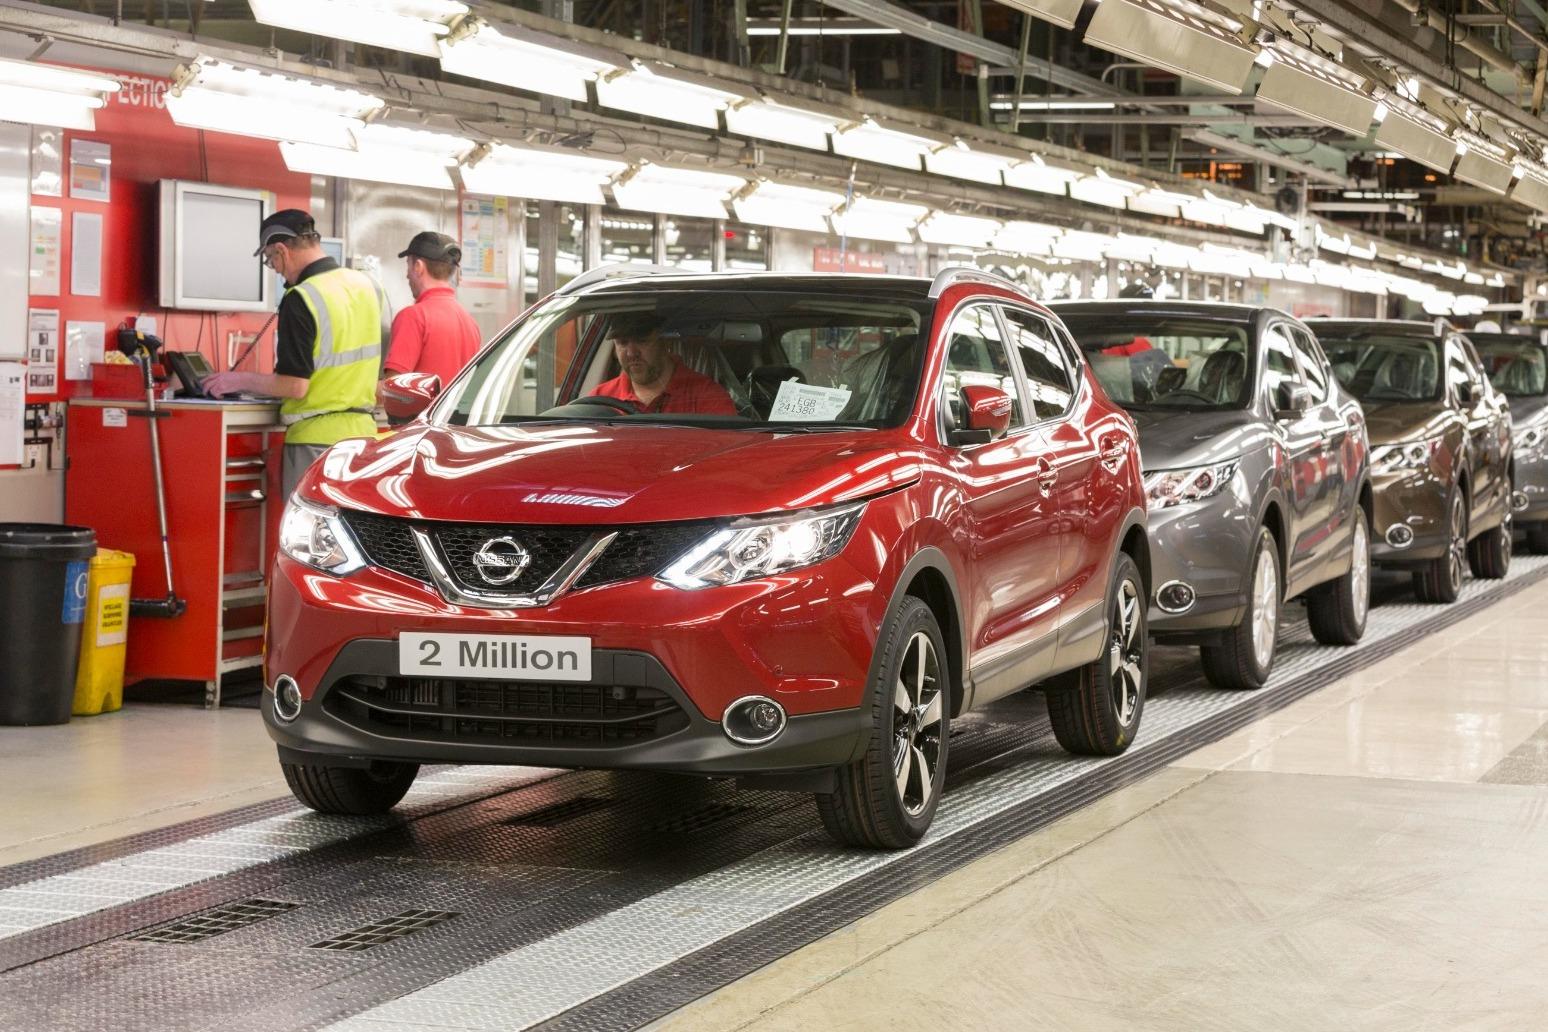 New Nissan Qashqai sales top 10,000 across Europe